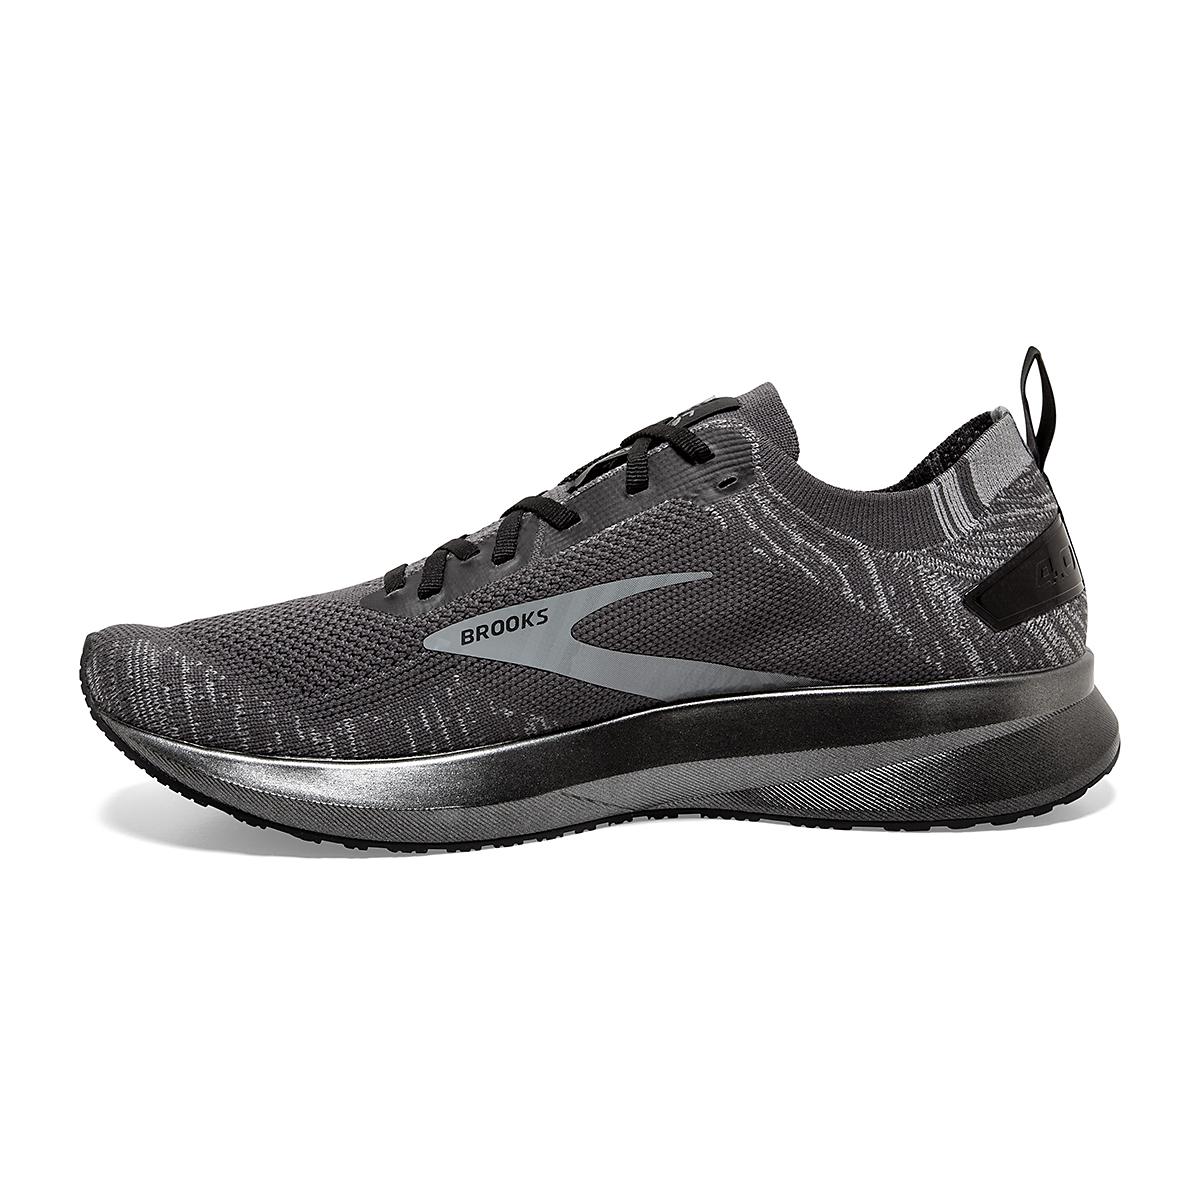 Men's Brooks Levitate 4 Running Shoe - Color: Blackened Pearl/Grey/Black - Size: 8 - Width: Regular, Blackened Pearl/Grey/Black, large, image 4